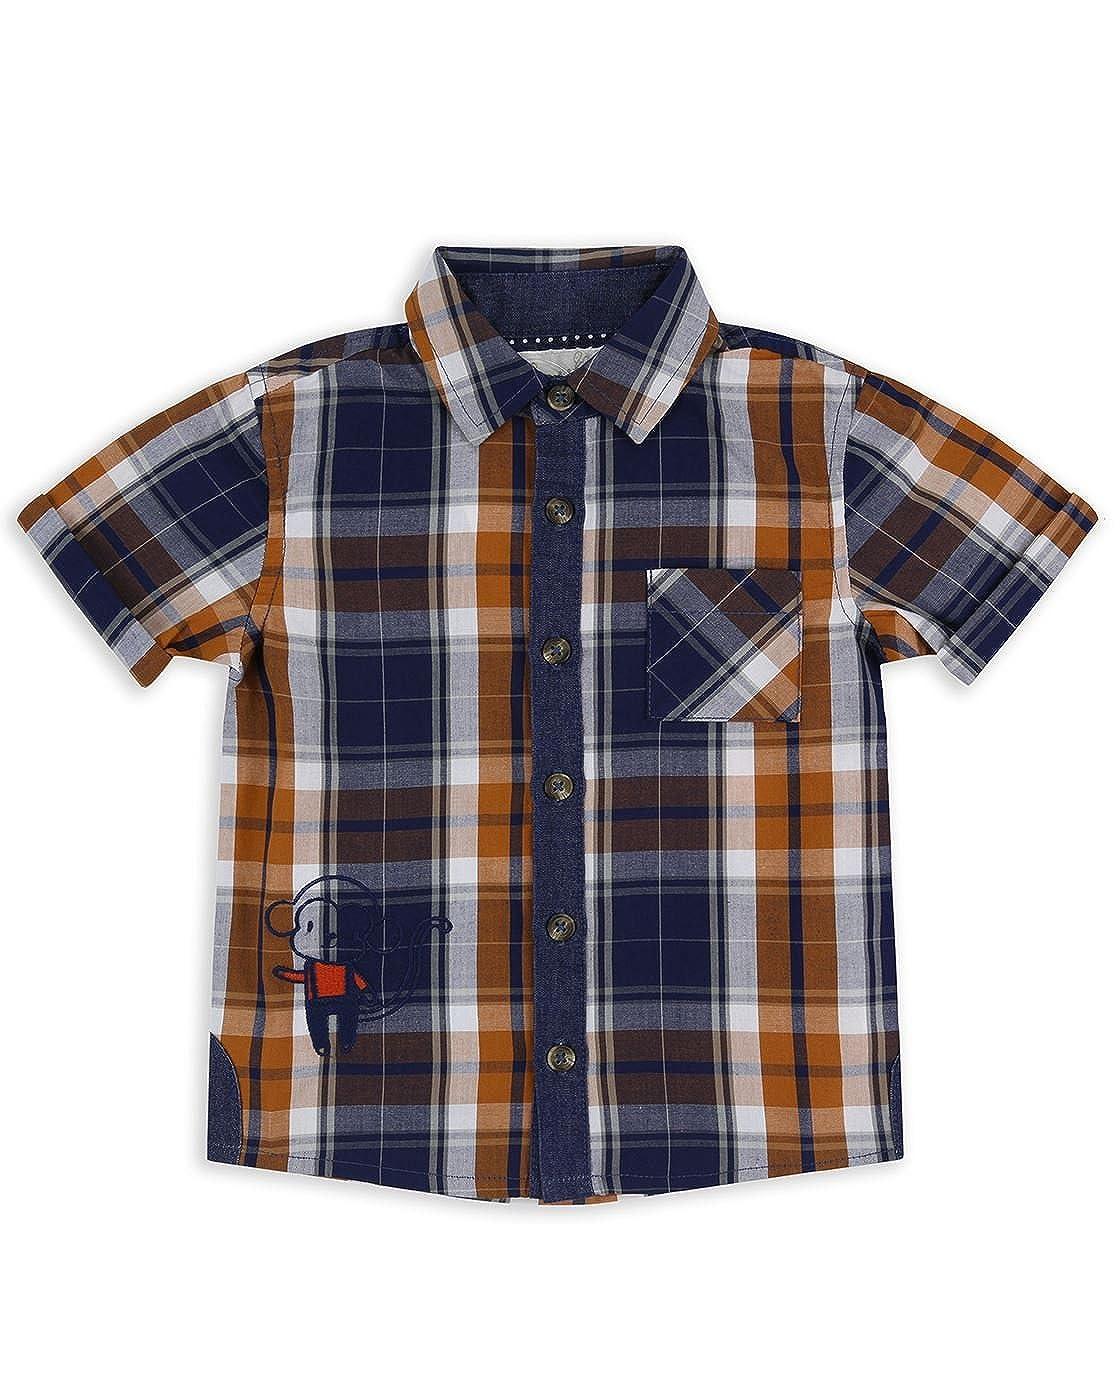 The Essential One Baby Kinder Jungen Hemd/Shirt Kurzarm - Orange/Blau - EOT435